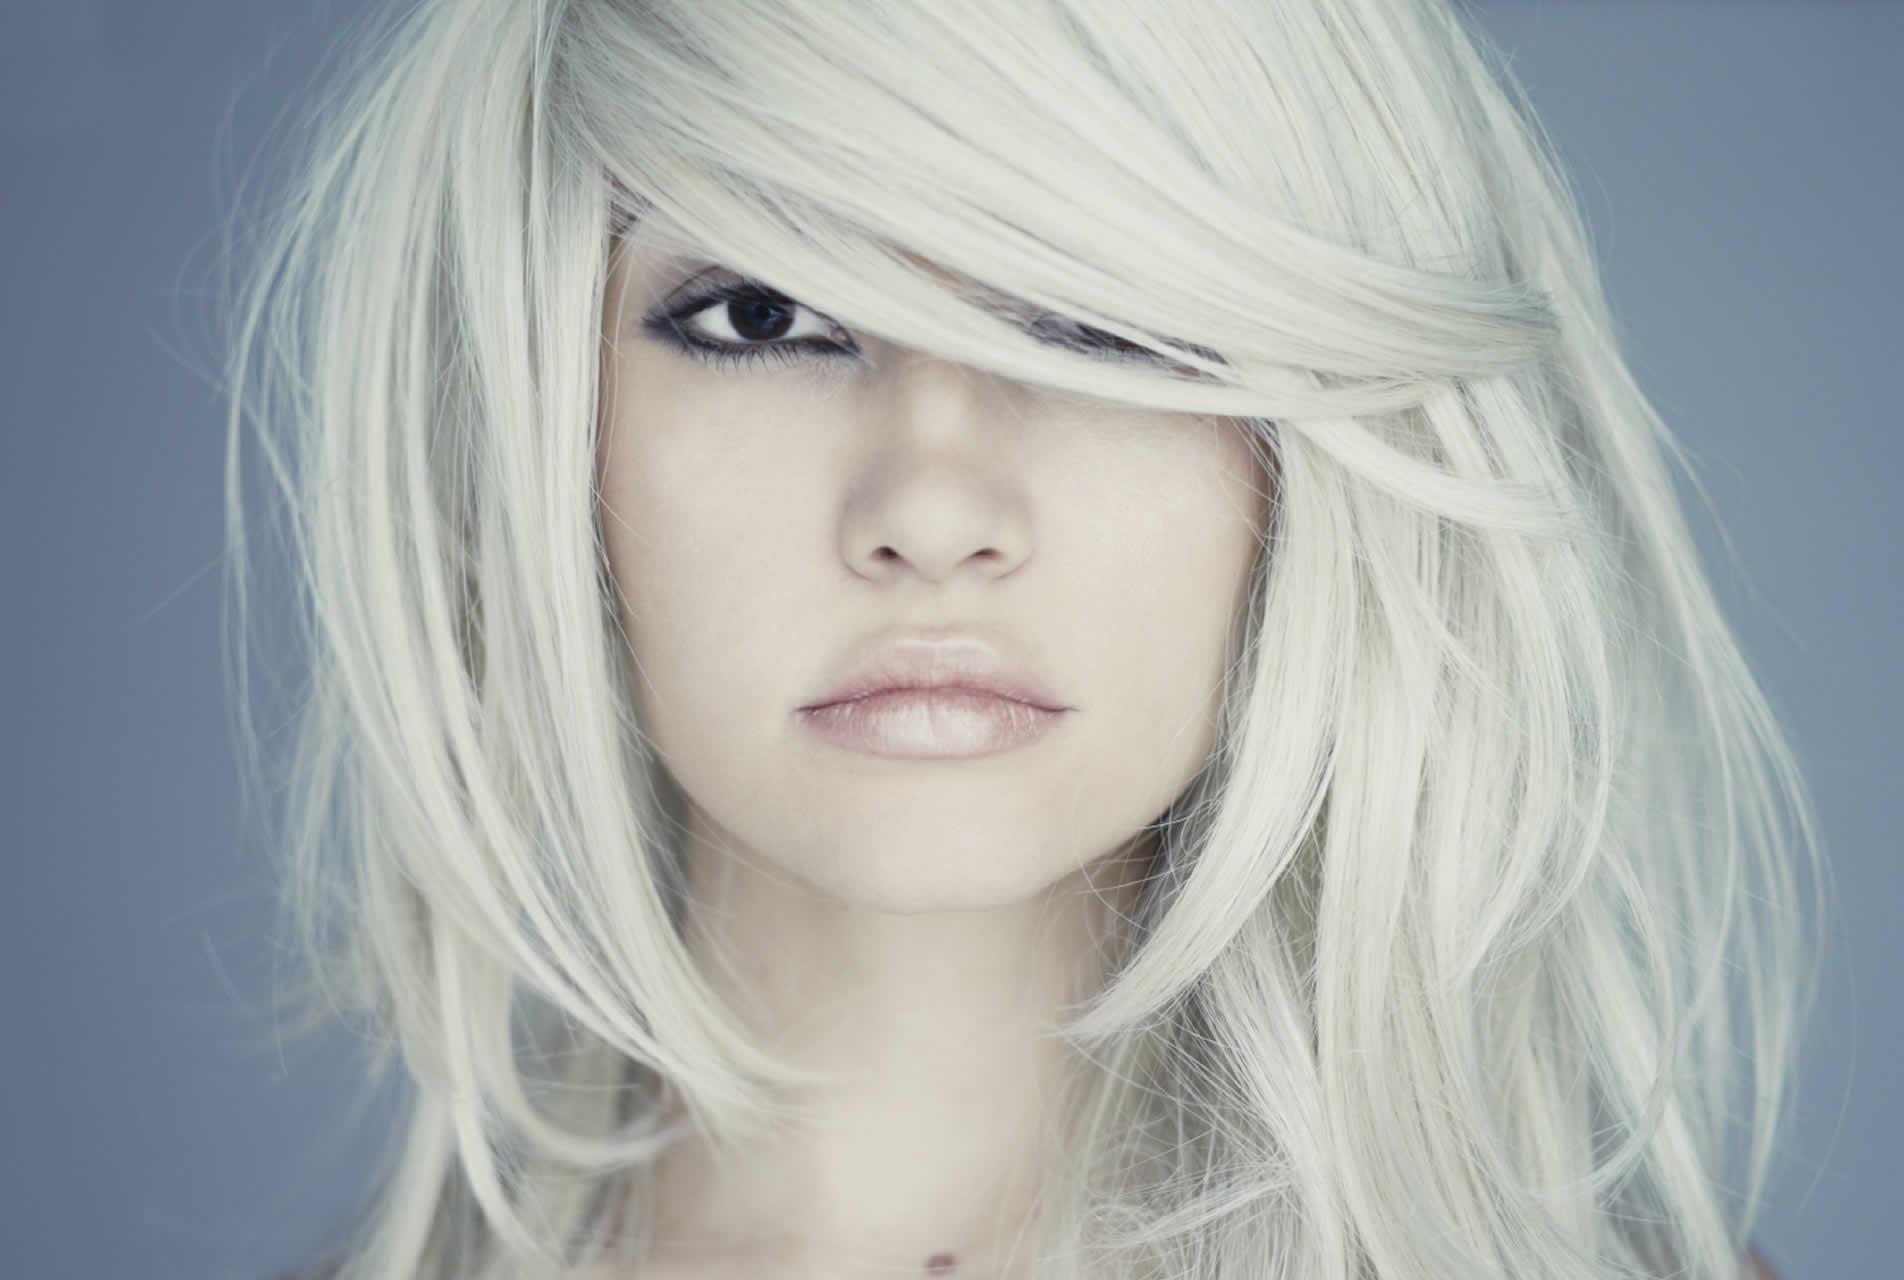 5ae8f3a1a233 Hair salon Clerkenwell